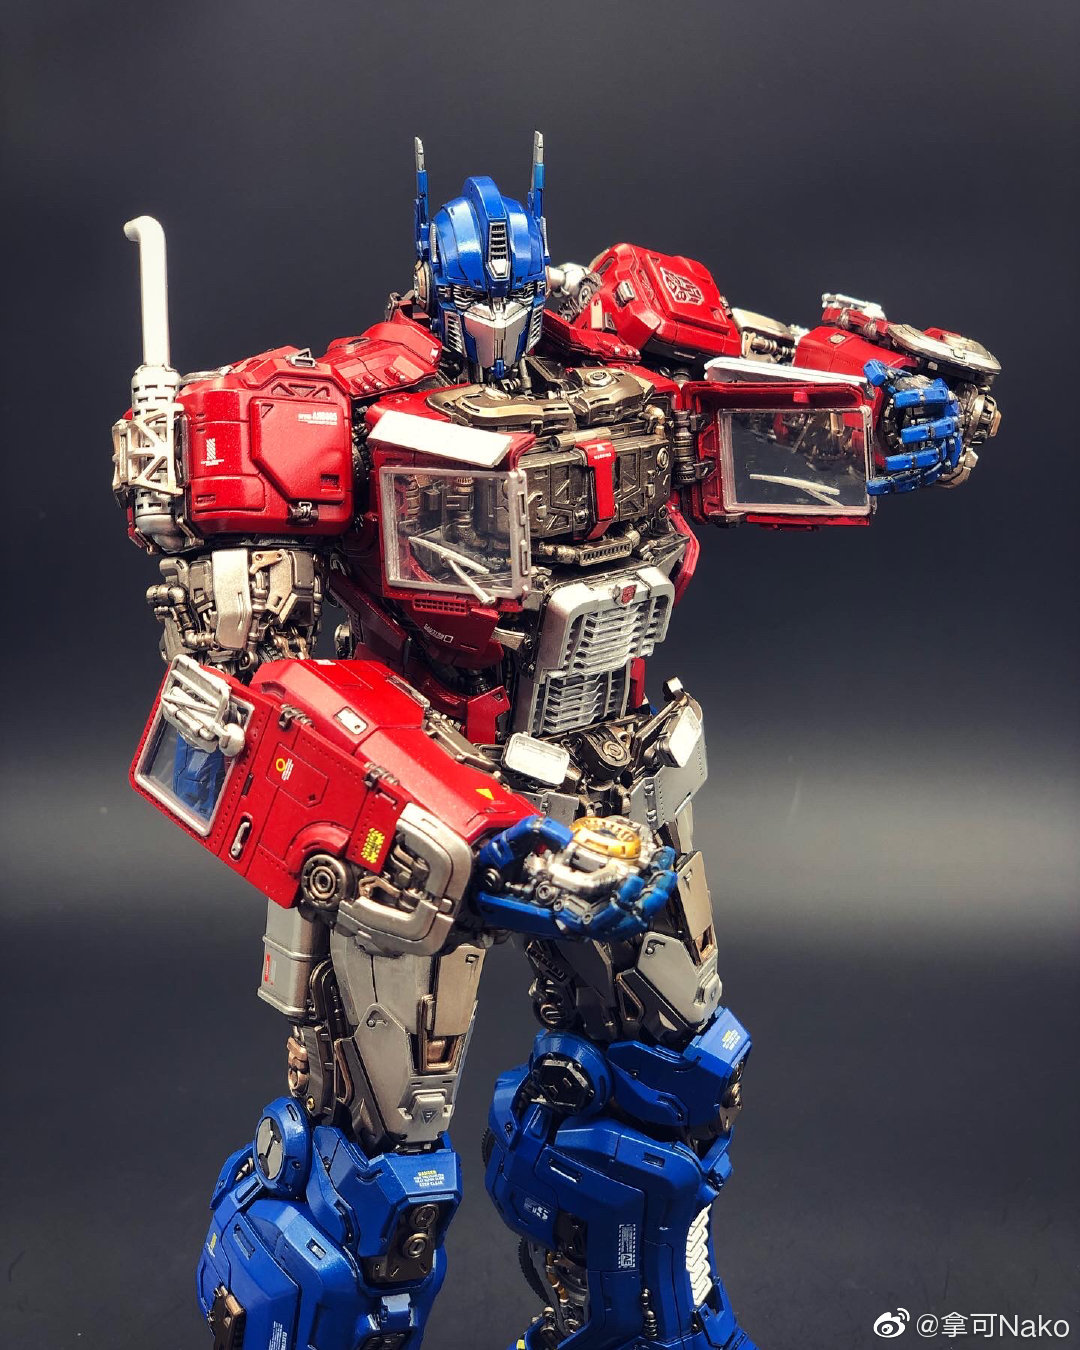 G798_NakoMake_Optimus_Prime_BUMBLEBEE_ver_GK_035.jpg